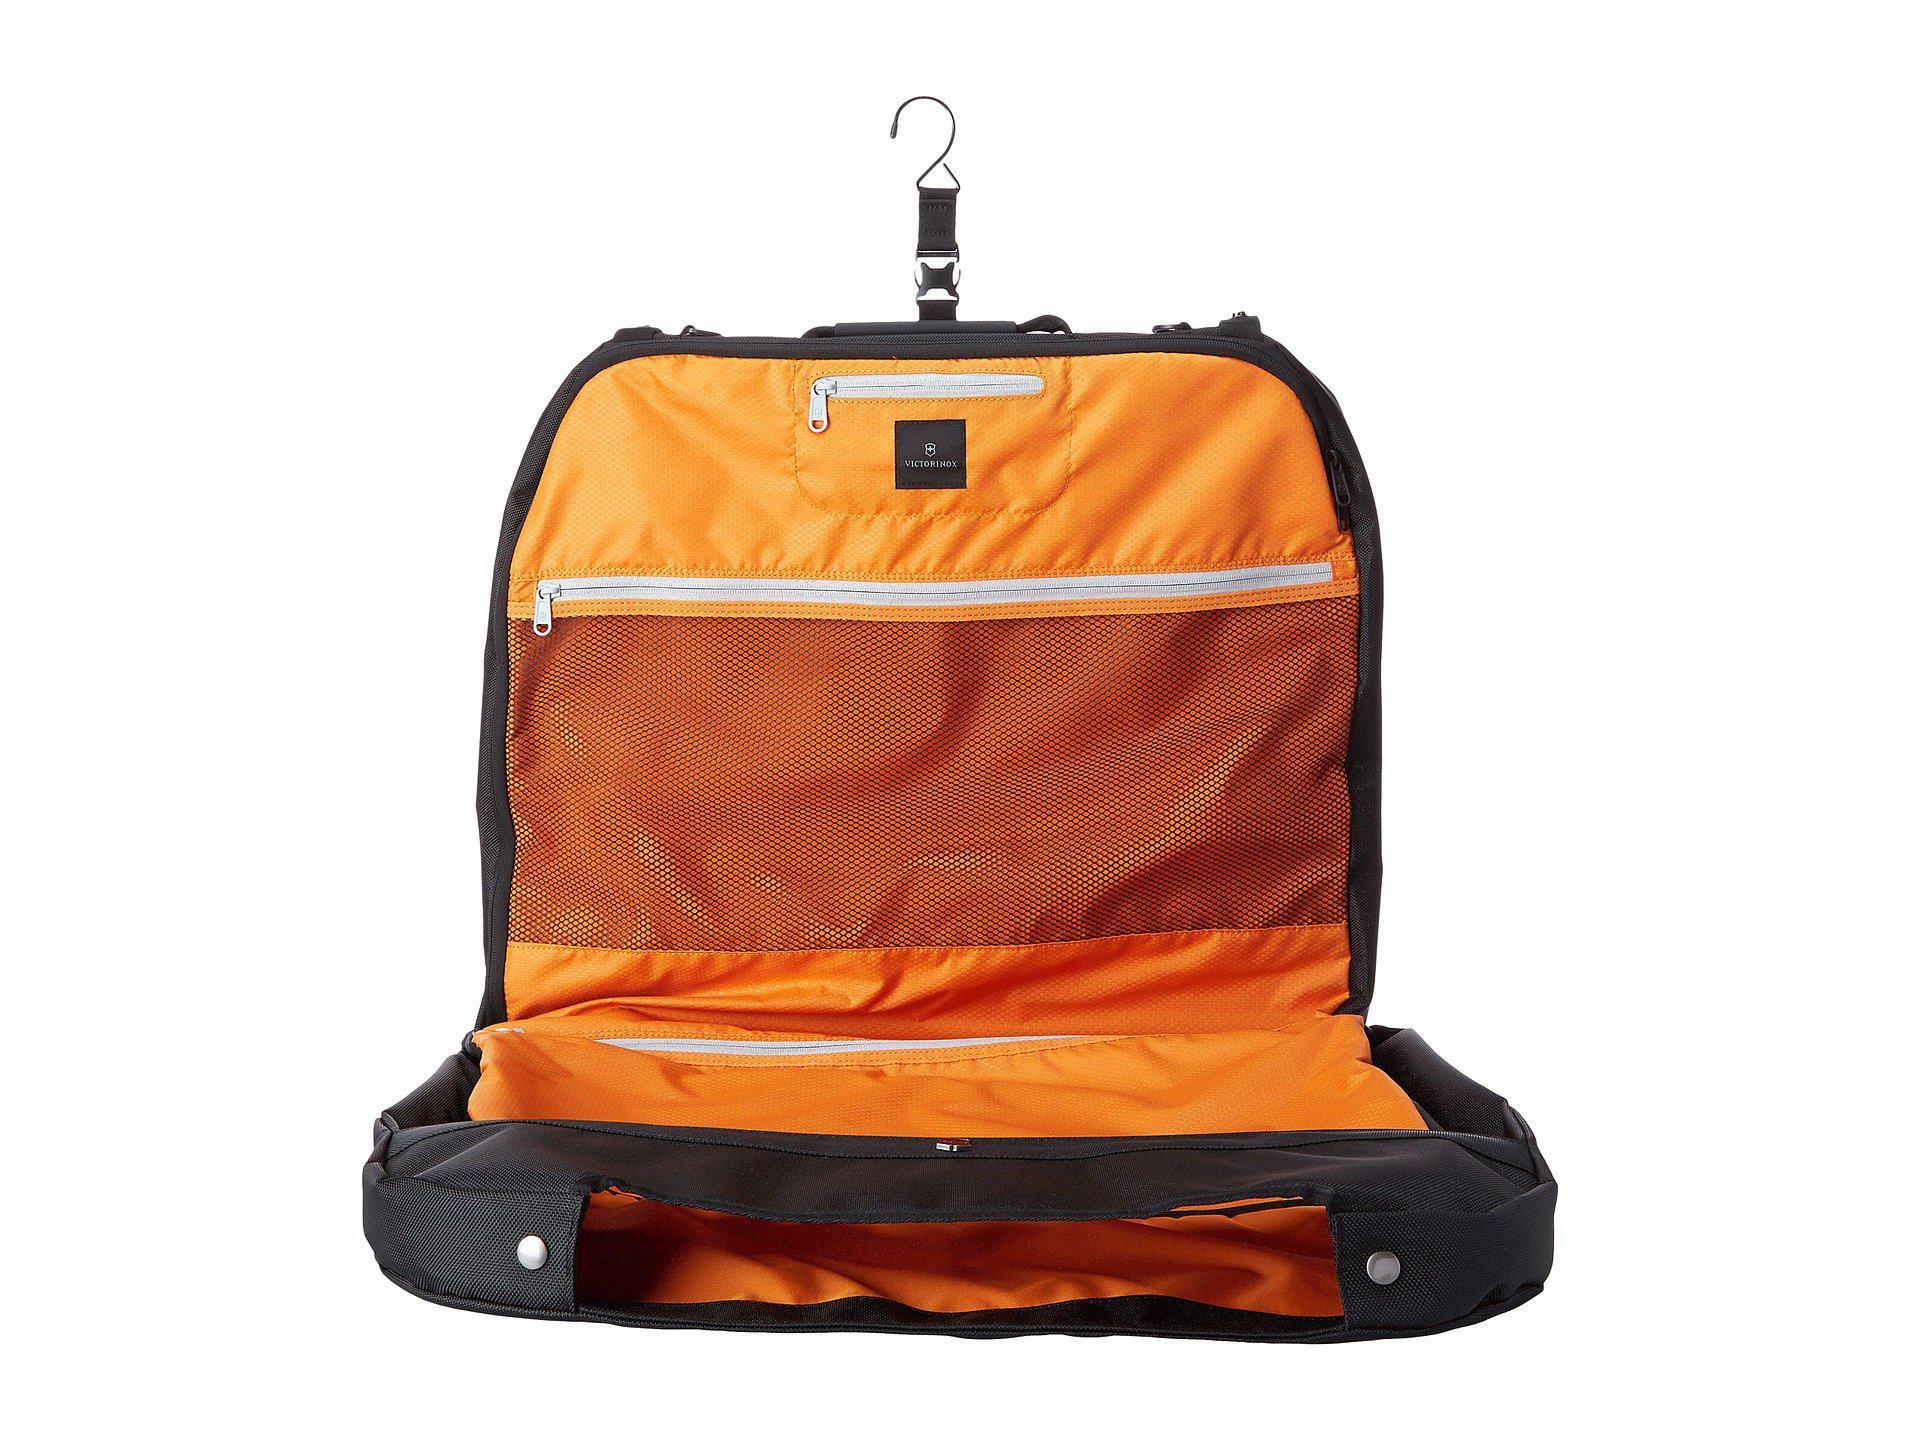 eb0064ba0 Victorinox Werks Traveler 5.0 - Wt Deluxe Garment Sleeve in Black - Lyst